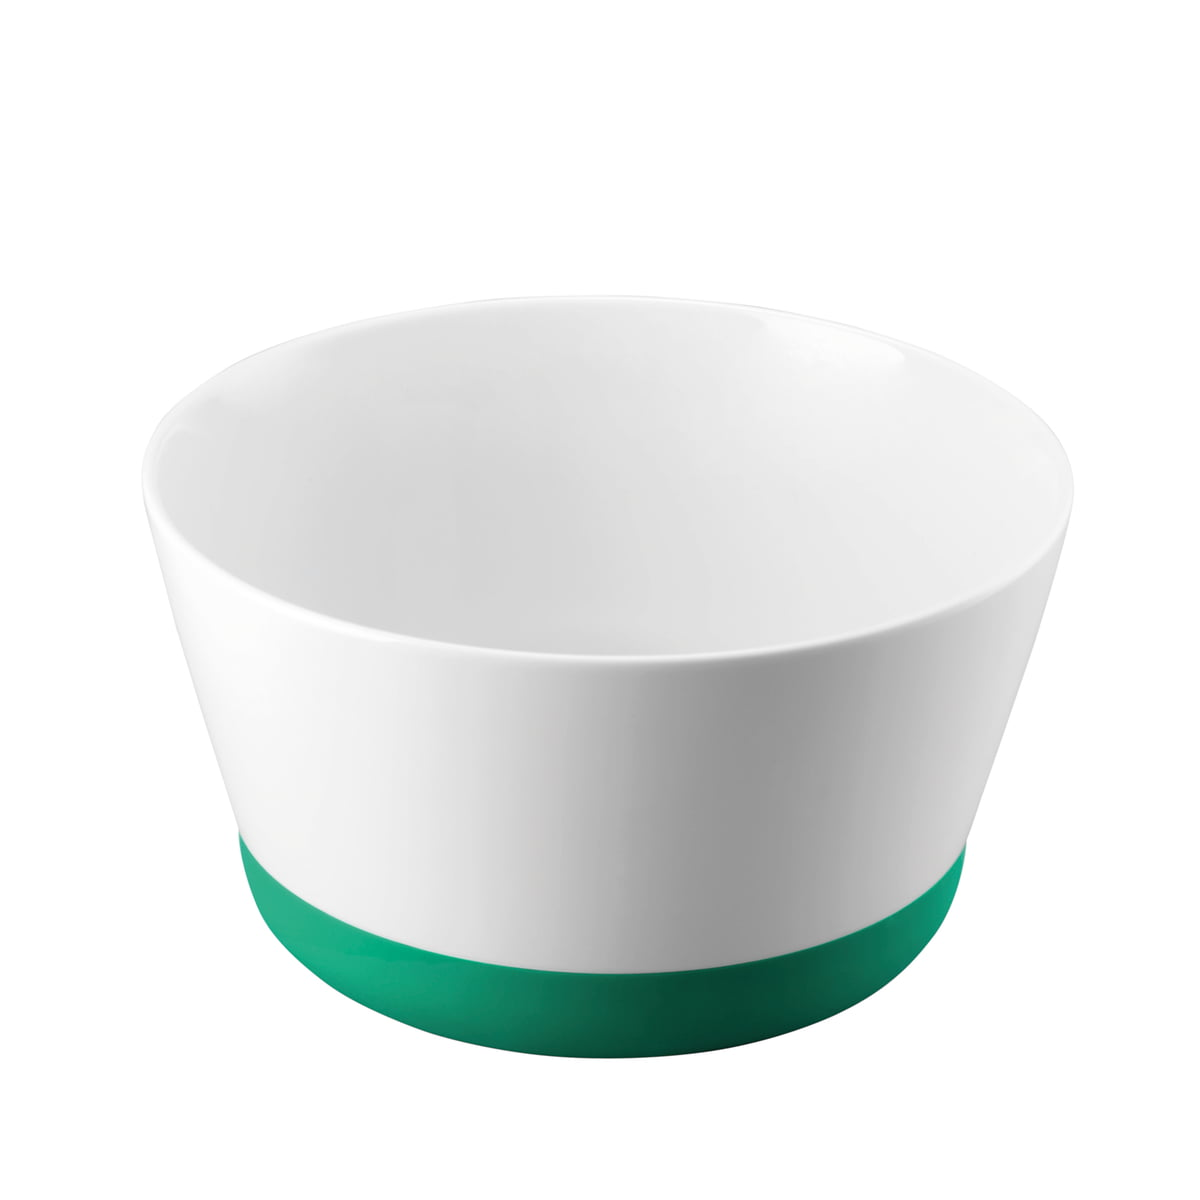 Thomas - Bowl with colander 22 cm (2-pcs.), green,